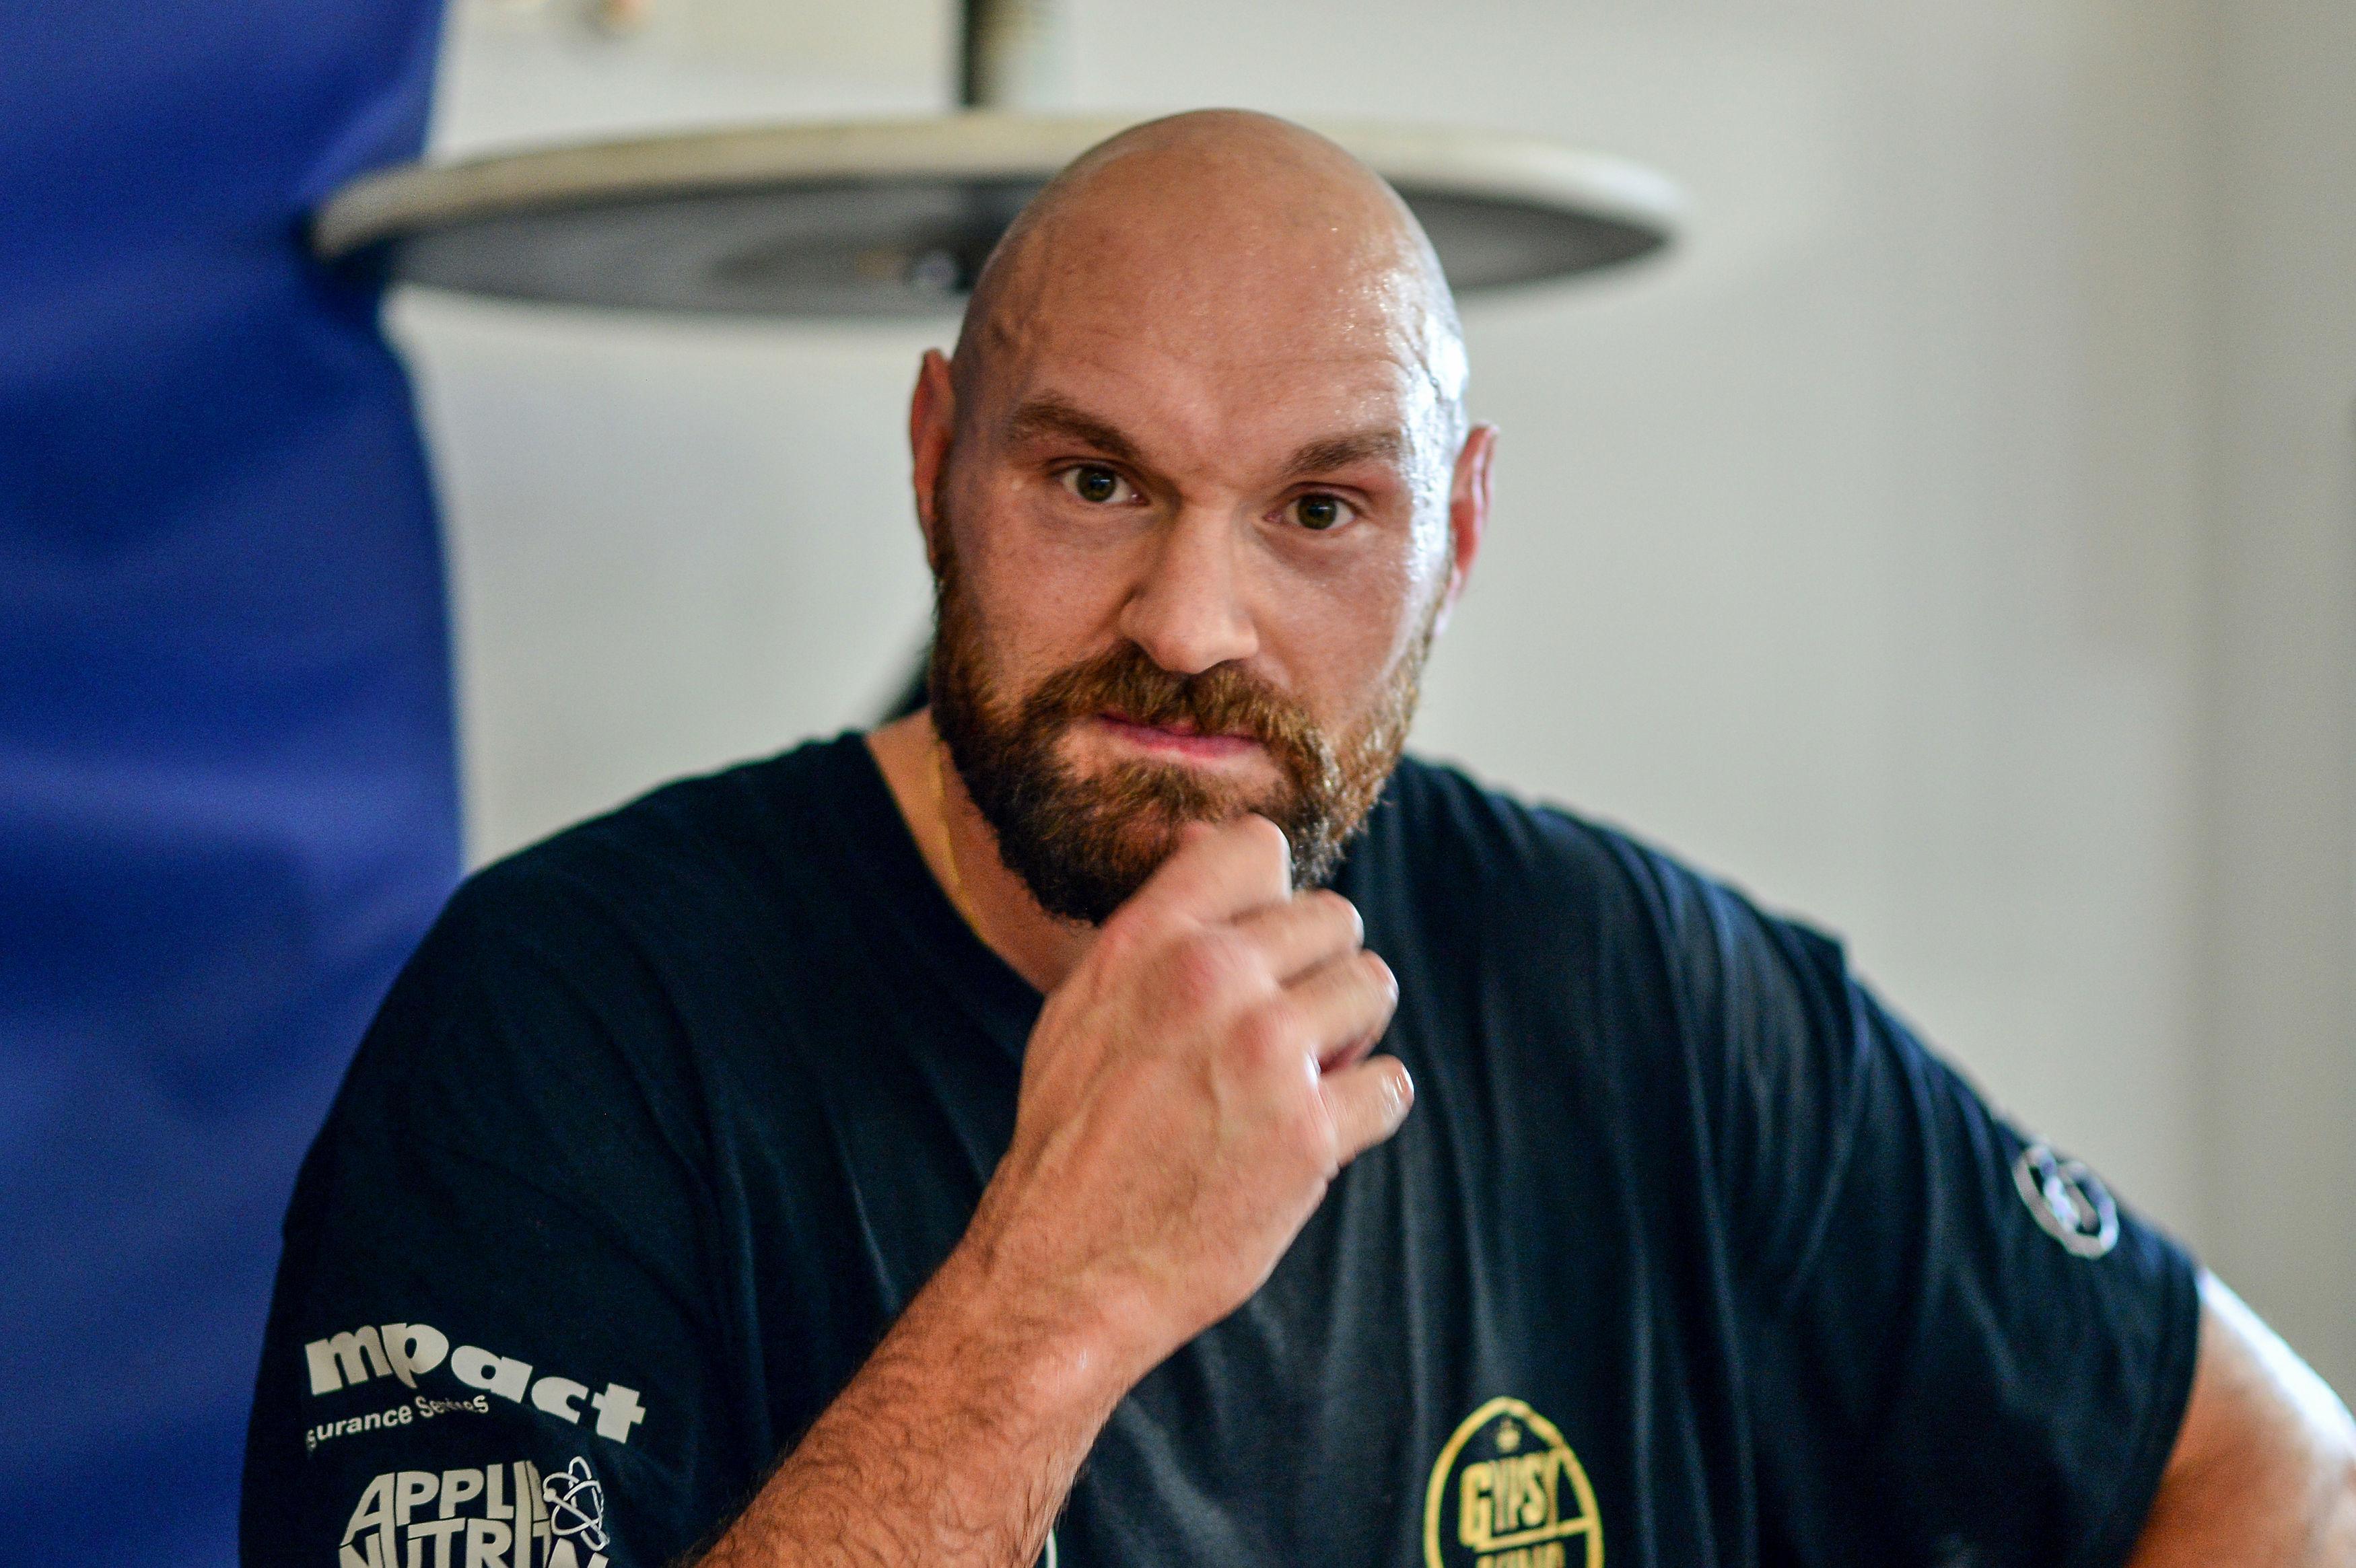 Gypsy King Fury faces Italian heavyweightFrancesco Pianeta on August 18